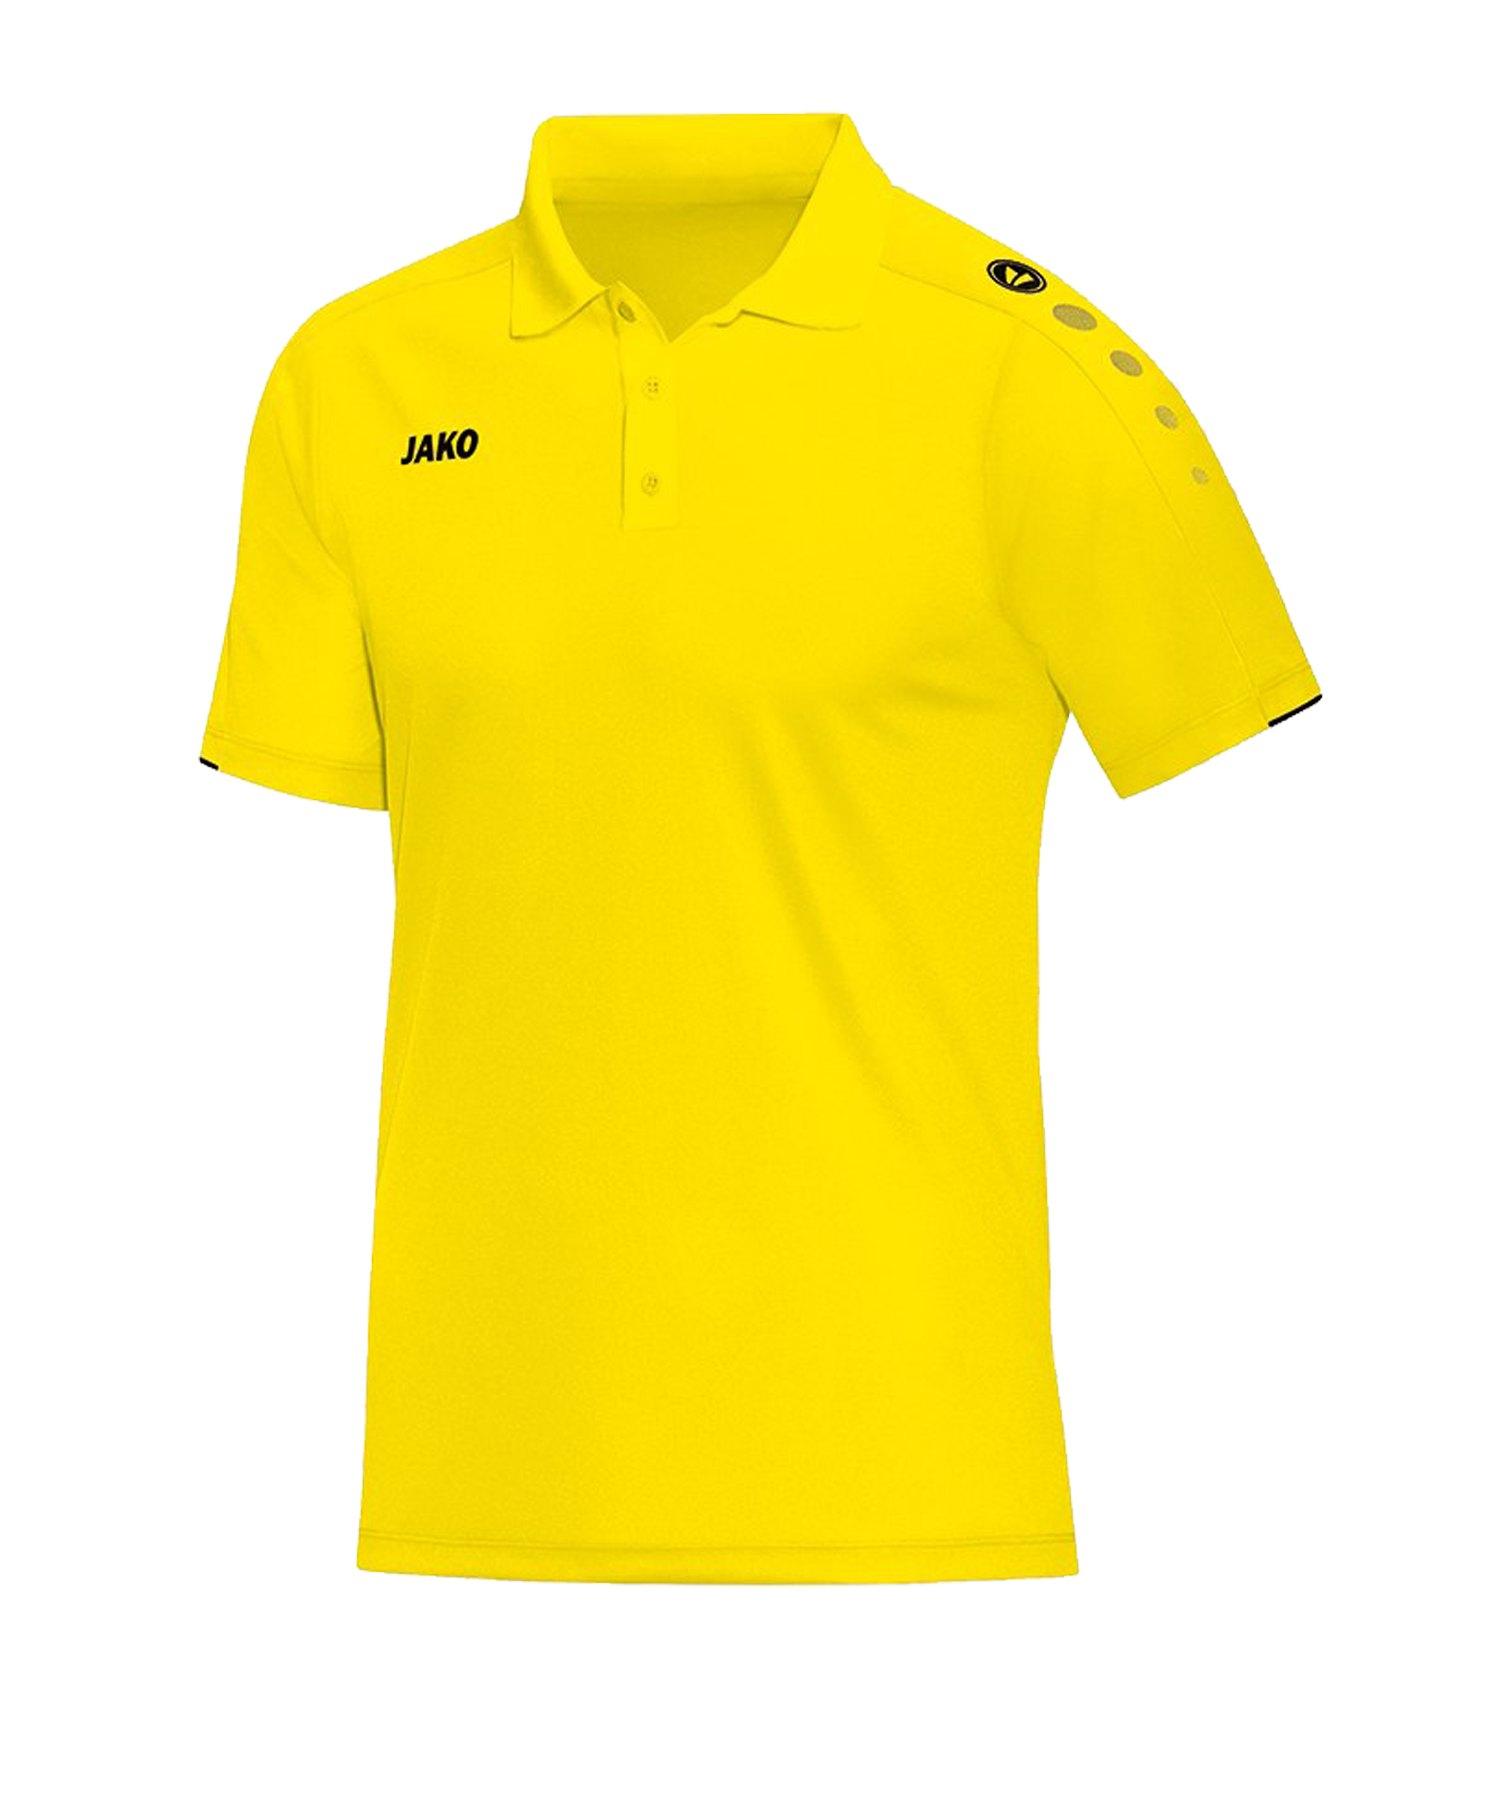 Jako Classico Poloshirt Gelb F03 - Gelb